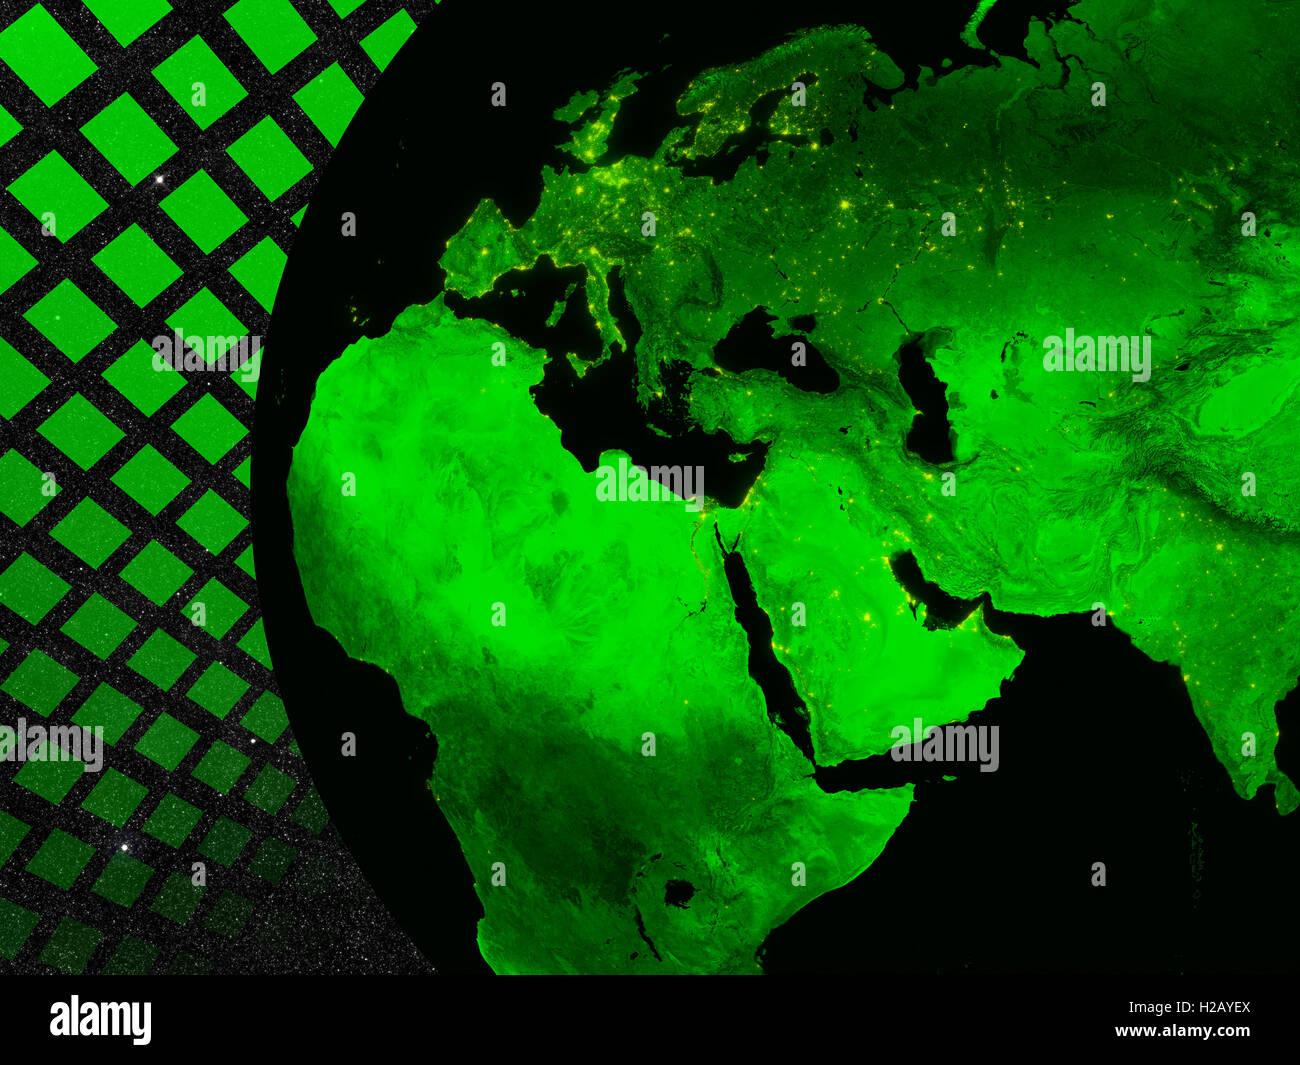 EMEA region technology concept - Stock Image